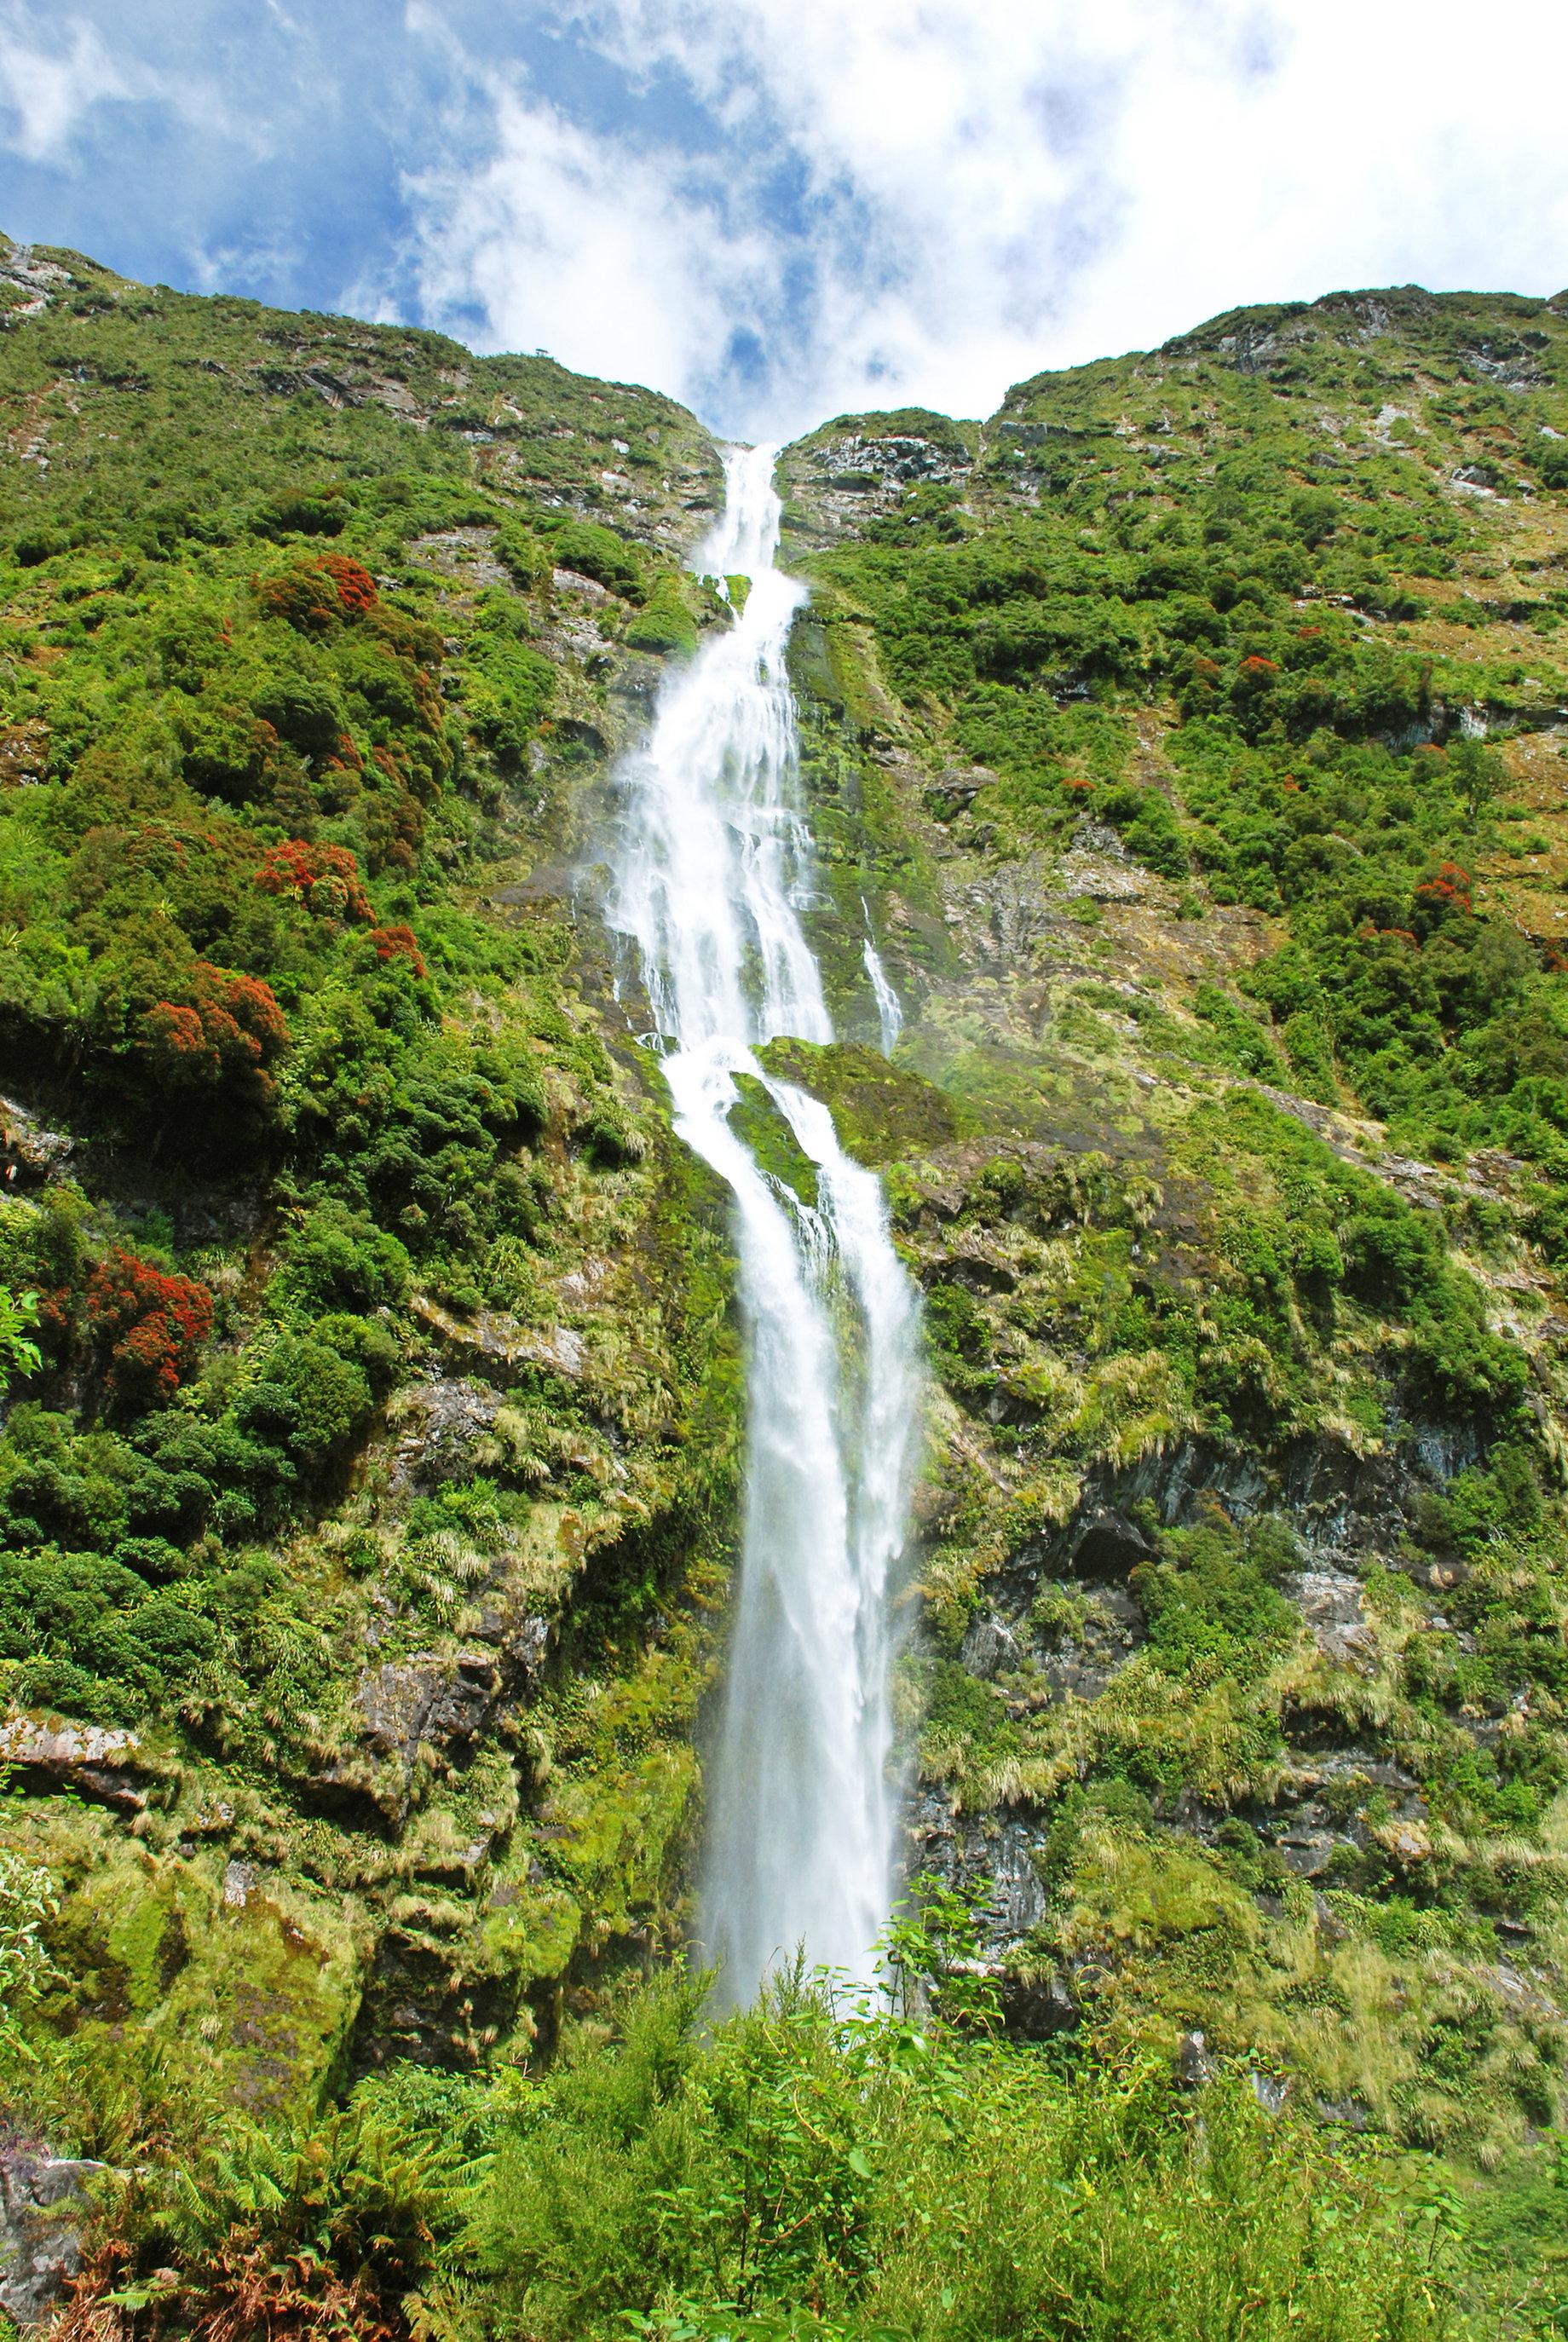 Secret Garden: The World's Most Beautiful Waterfalls: Niagara Falls